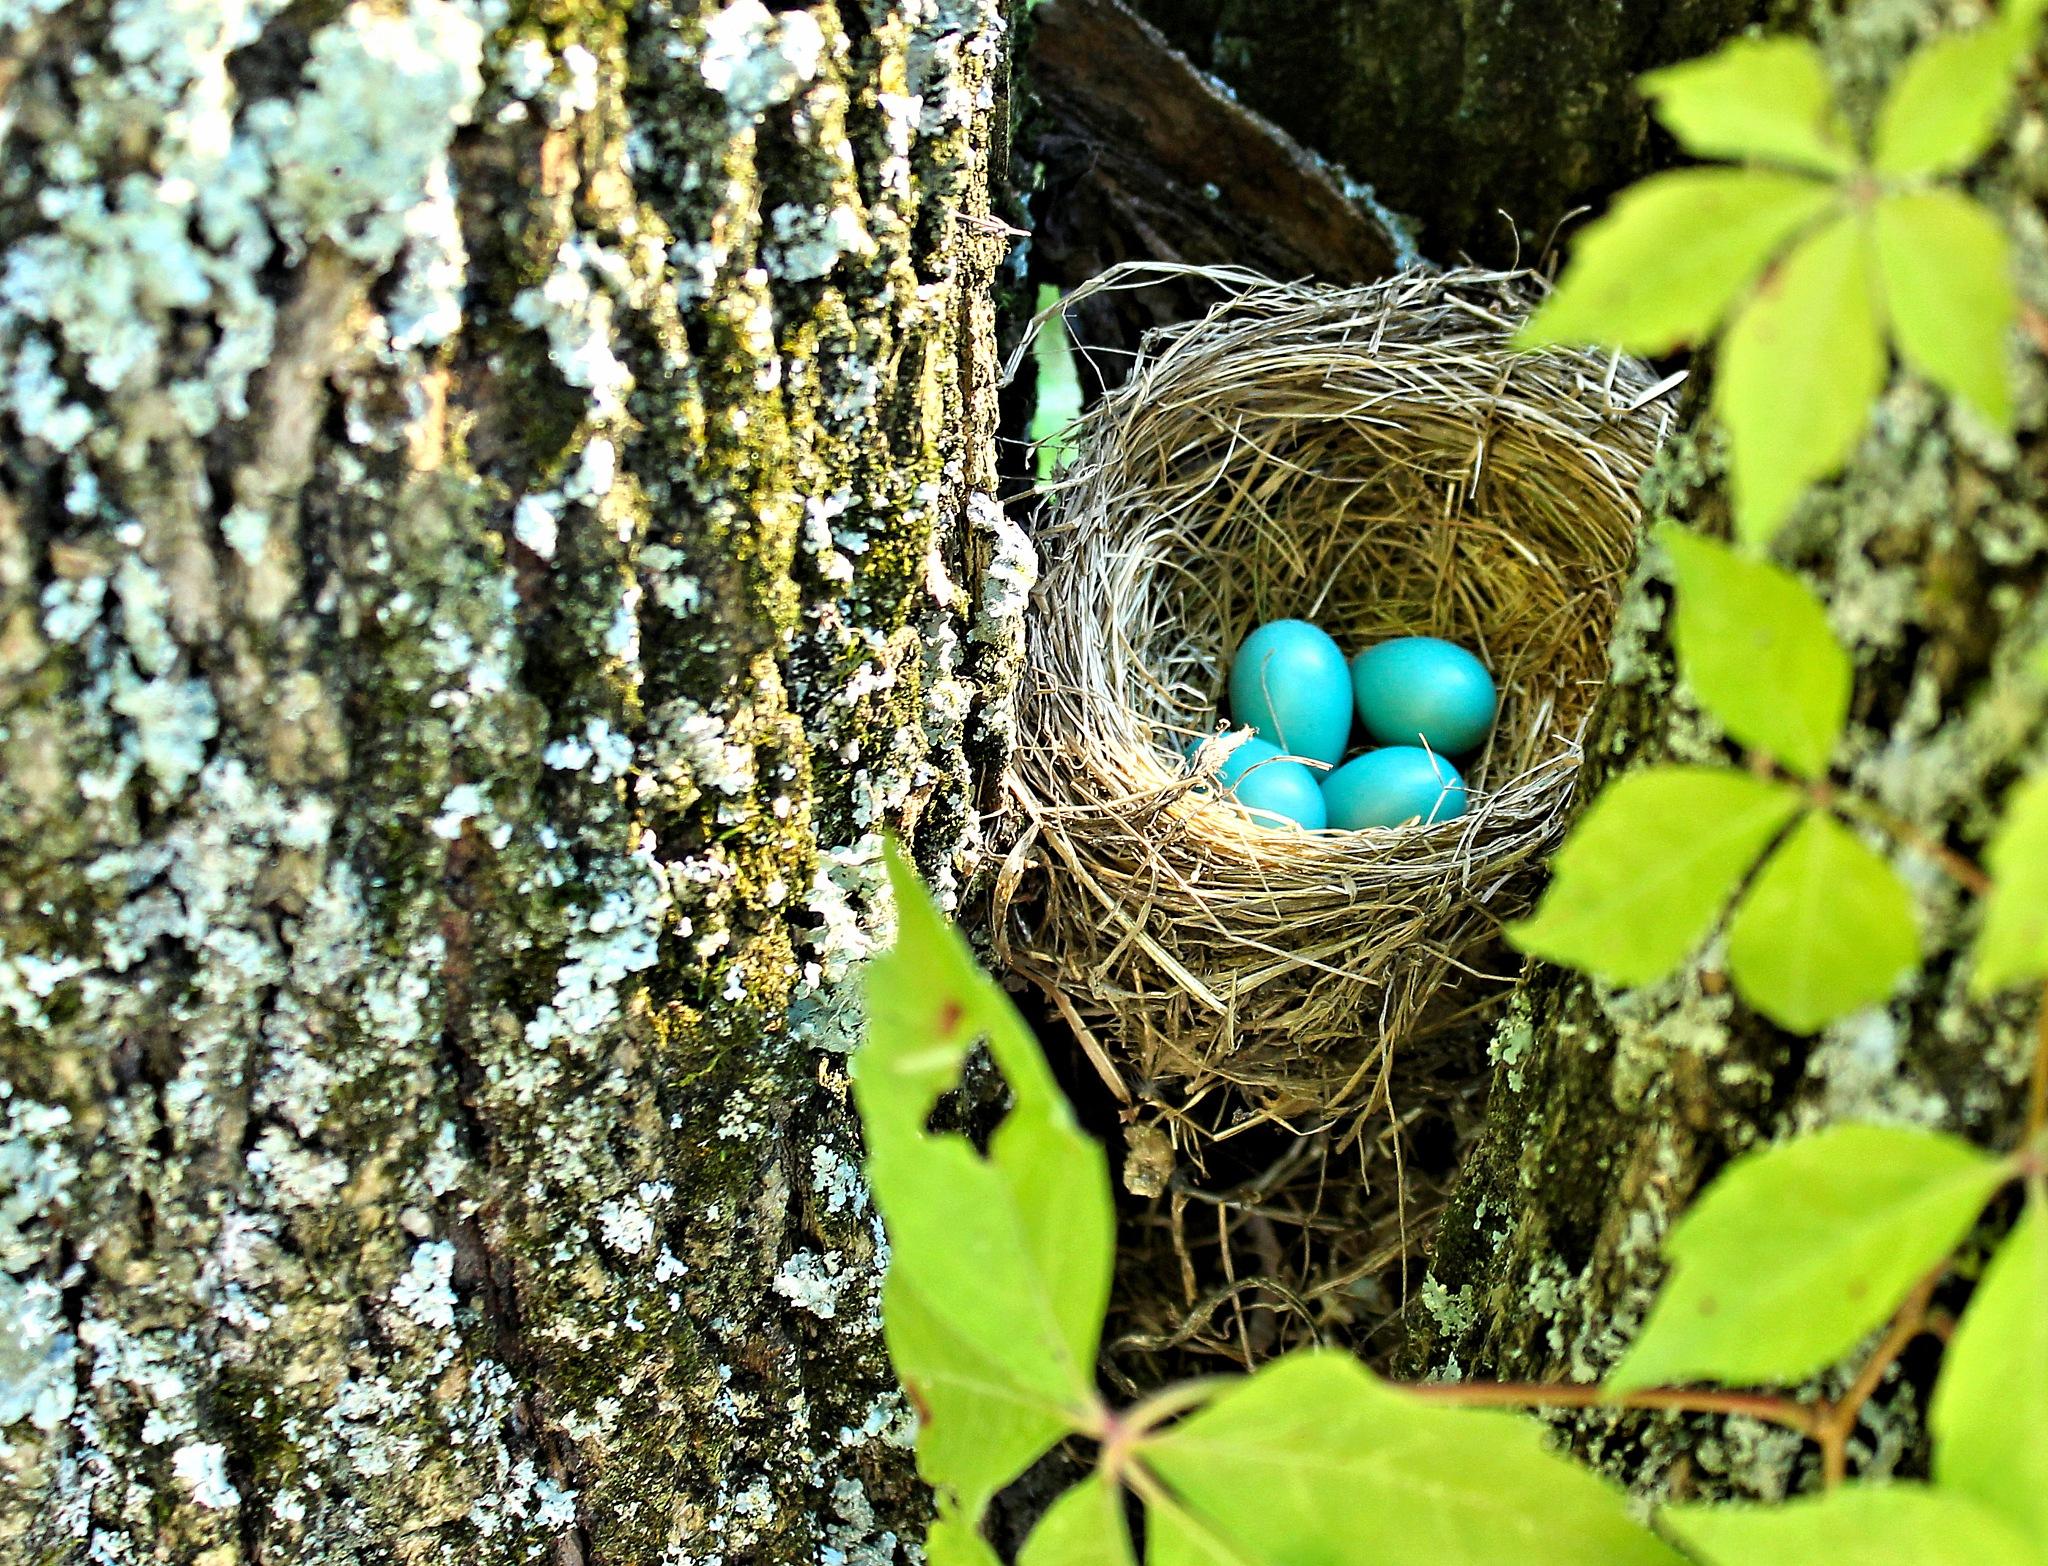 Robins Nest by sherry.laydaugherty